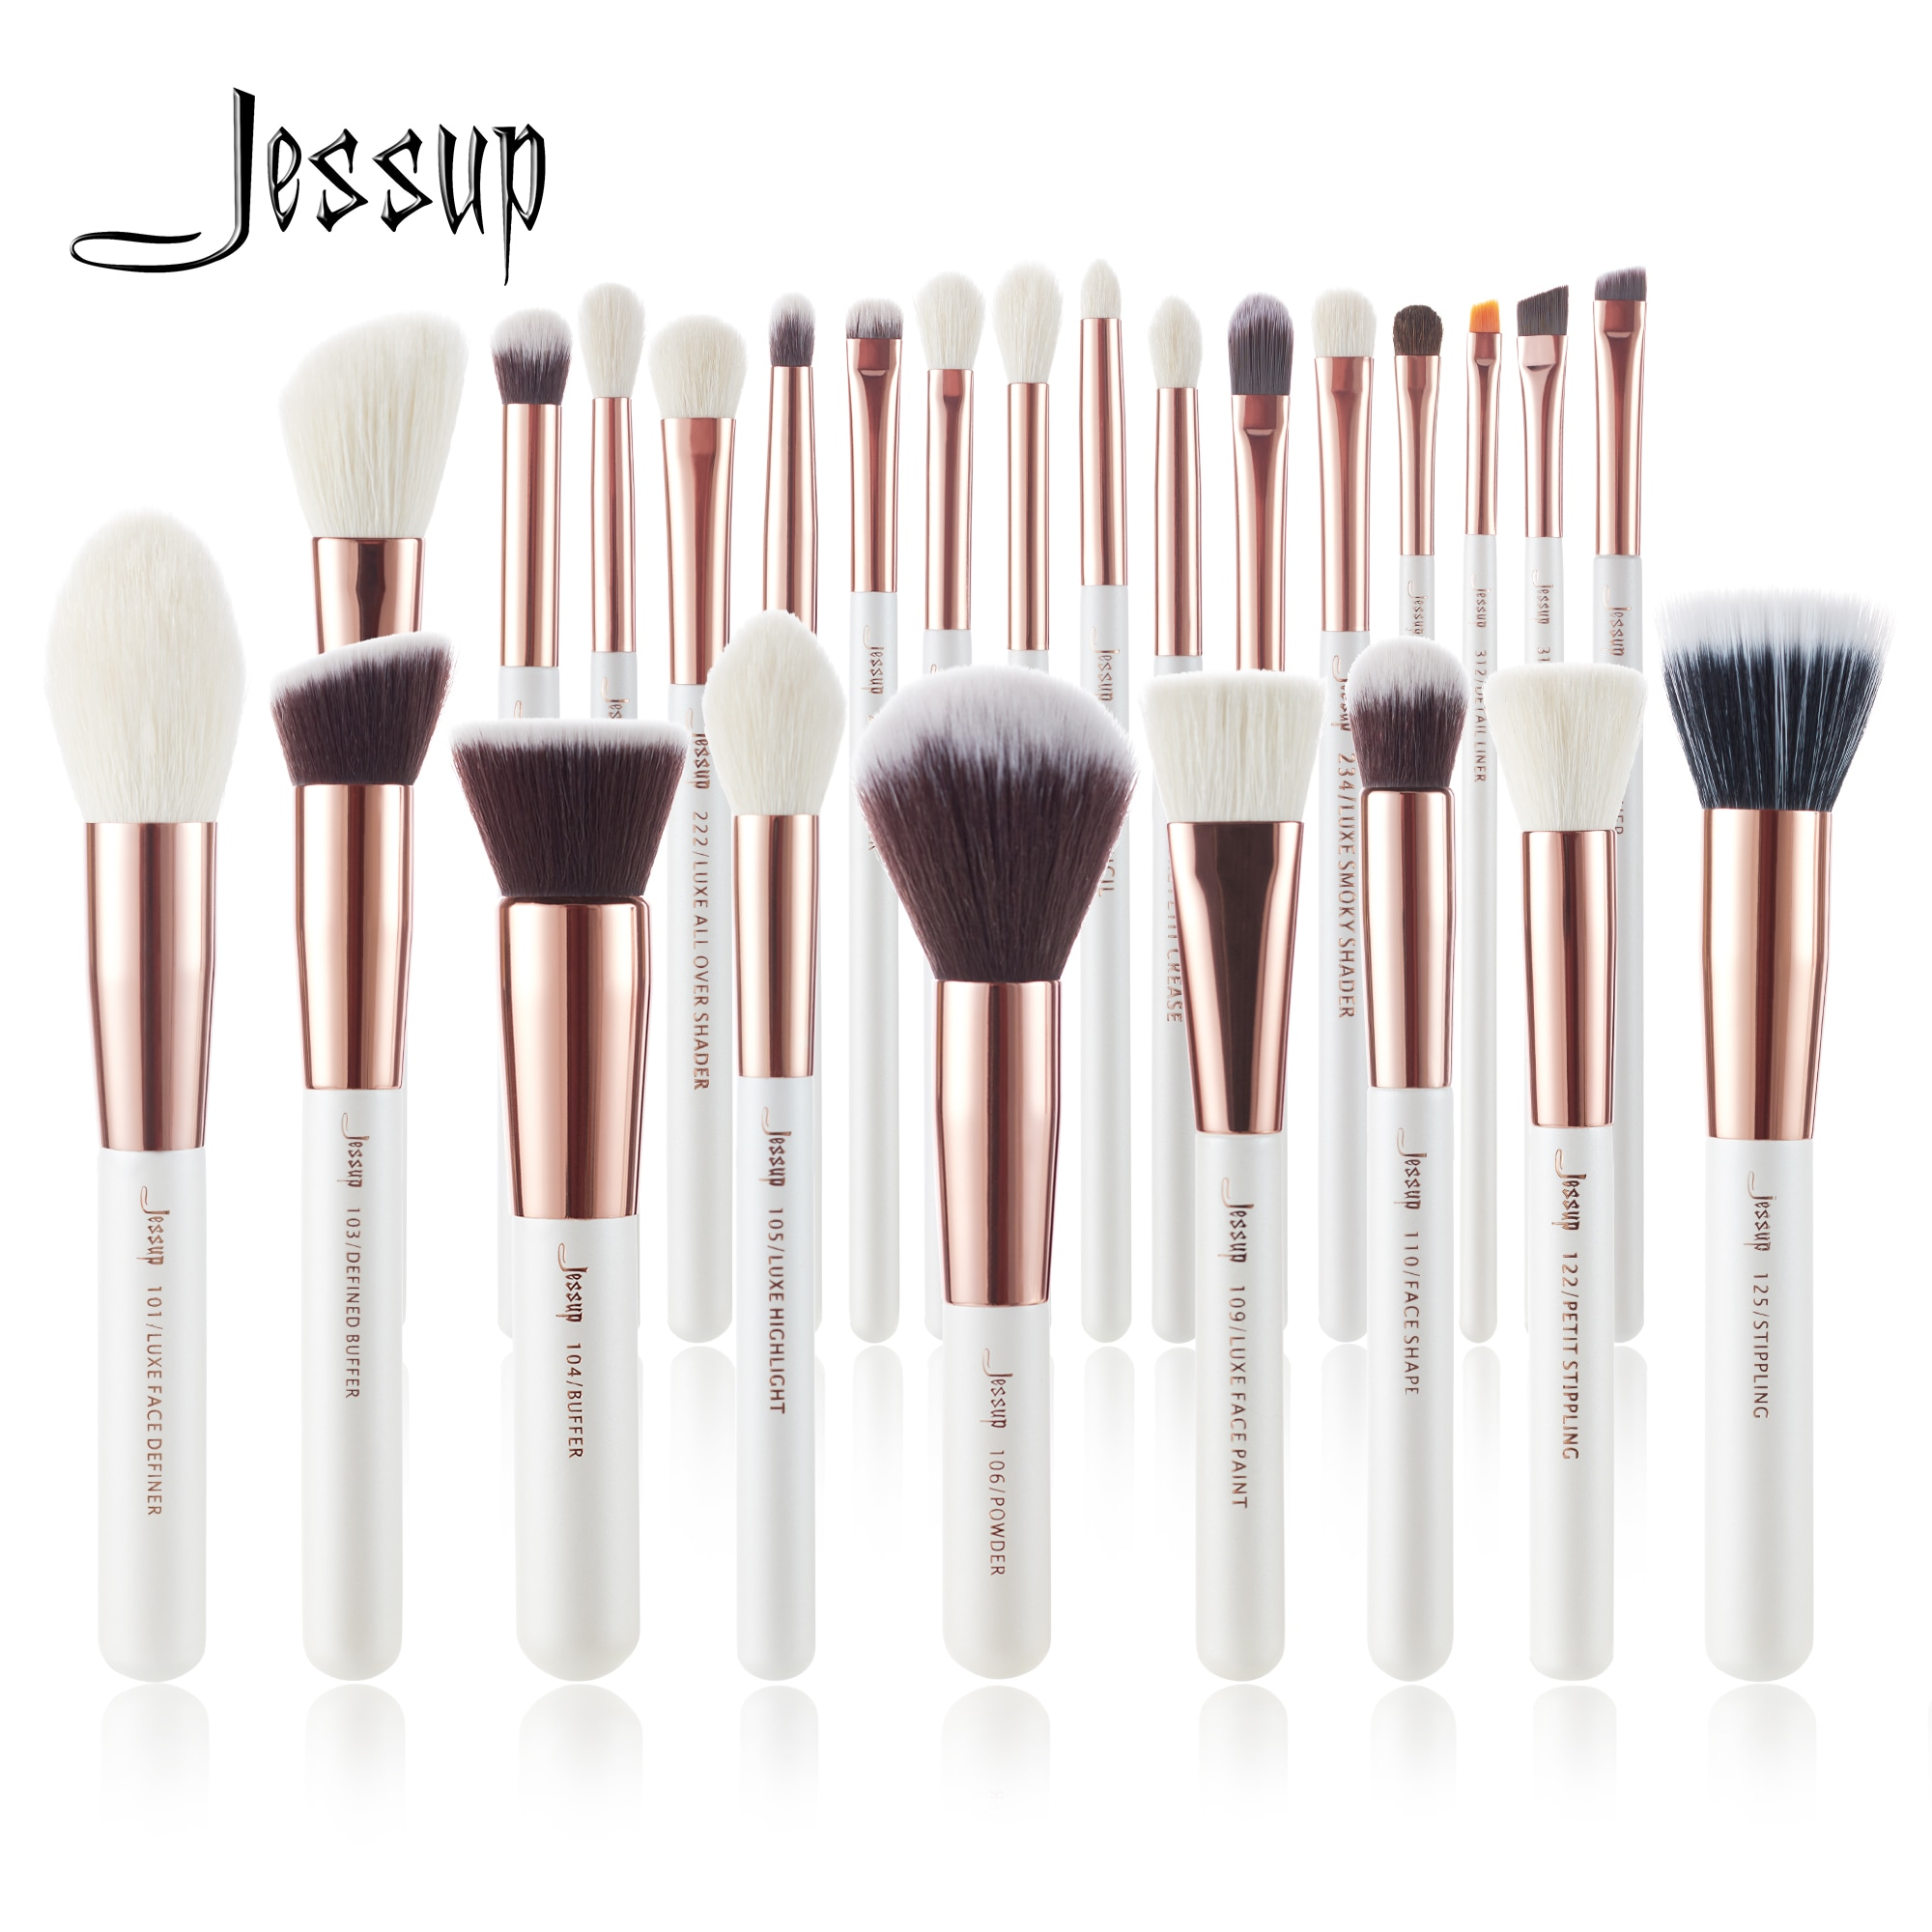 Jessup Makeup brushes set 6-25pcs Pearl White / Rose Gold Professional Make up brush Natural hair Fo